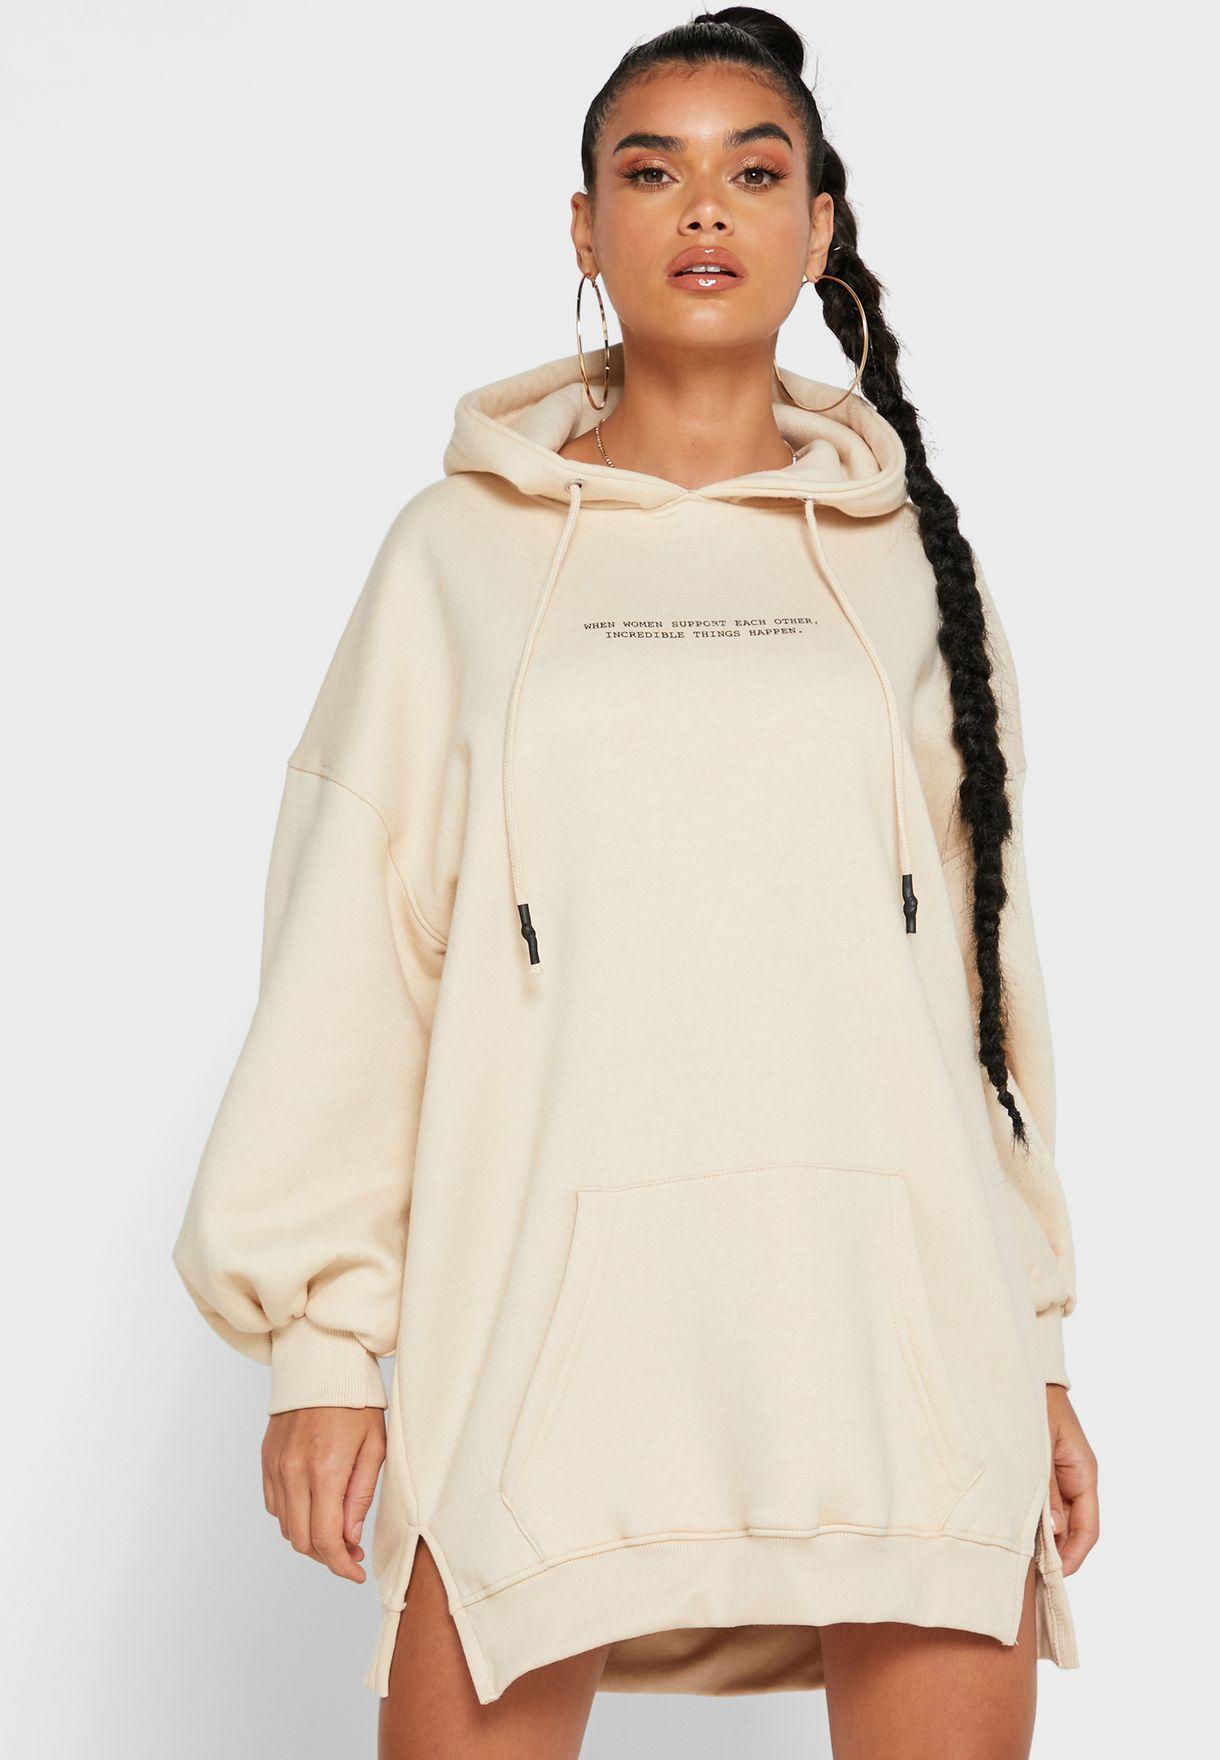 Oversized Hooded Sweat Dress